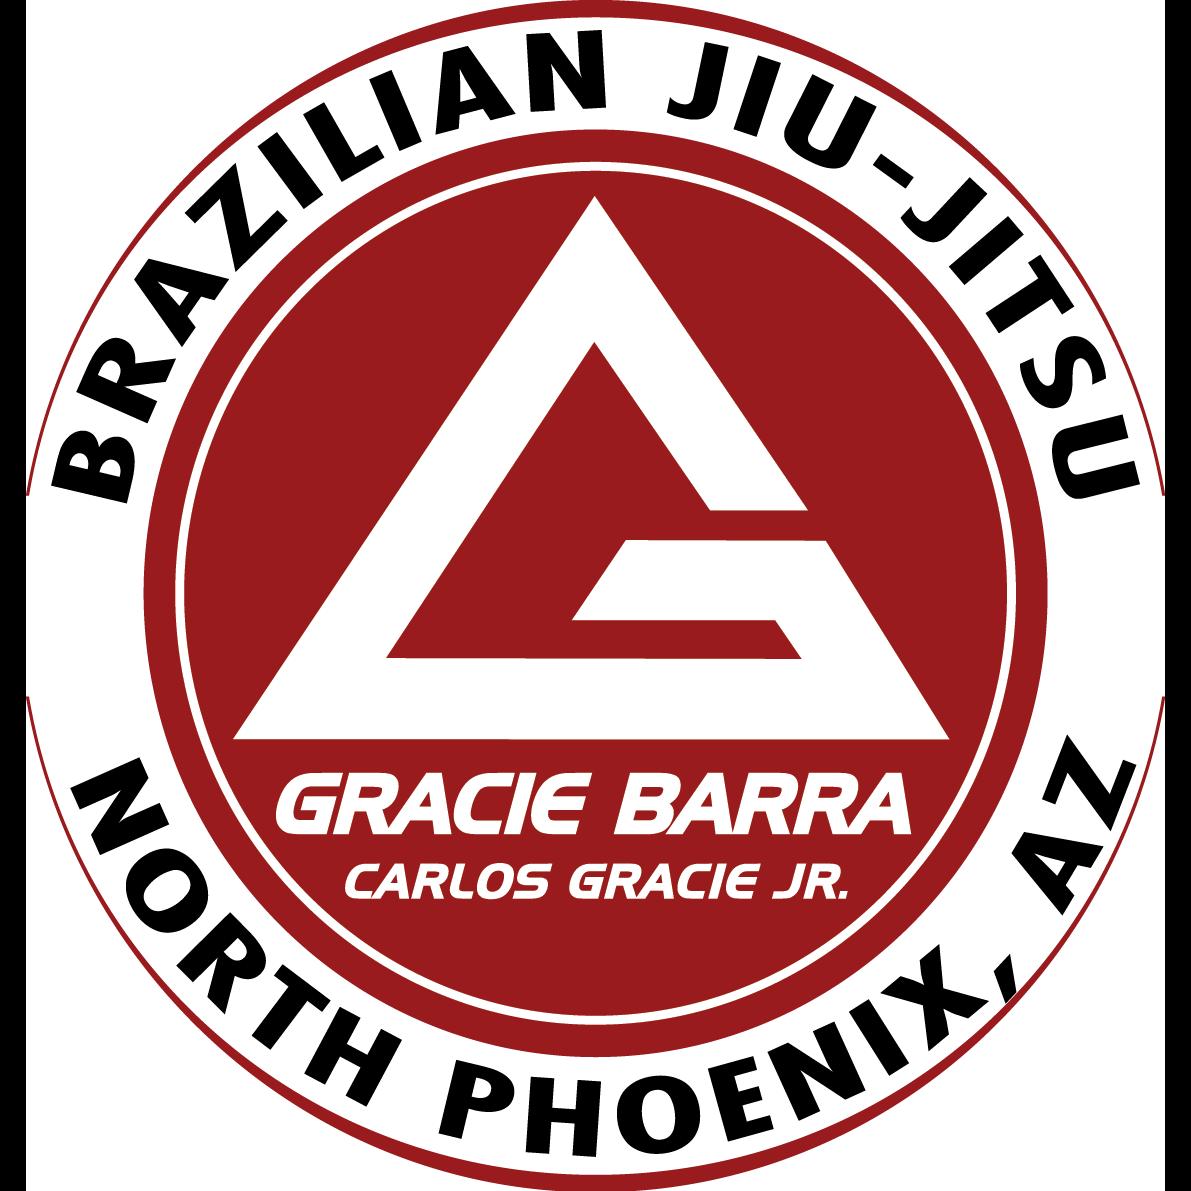 Gracie Barra North Phoenix, AZ